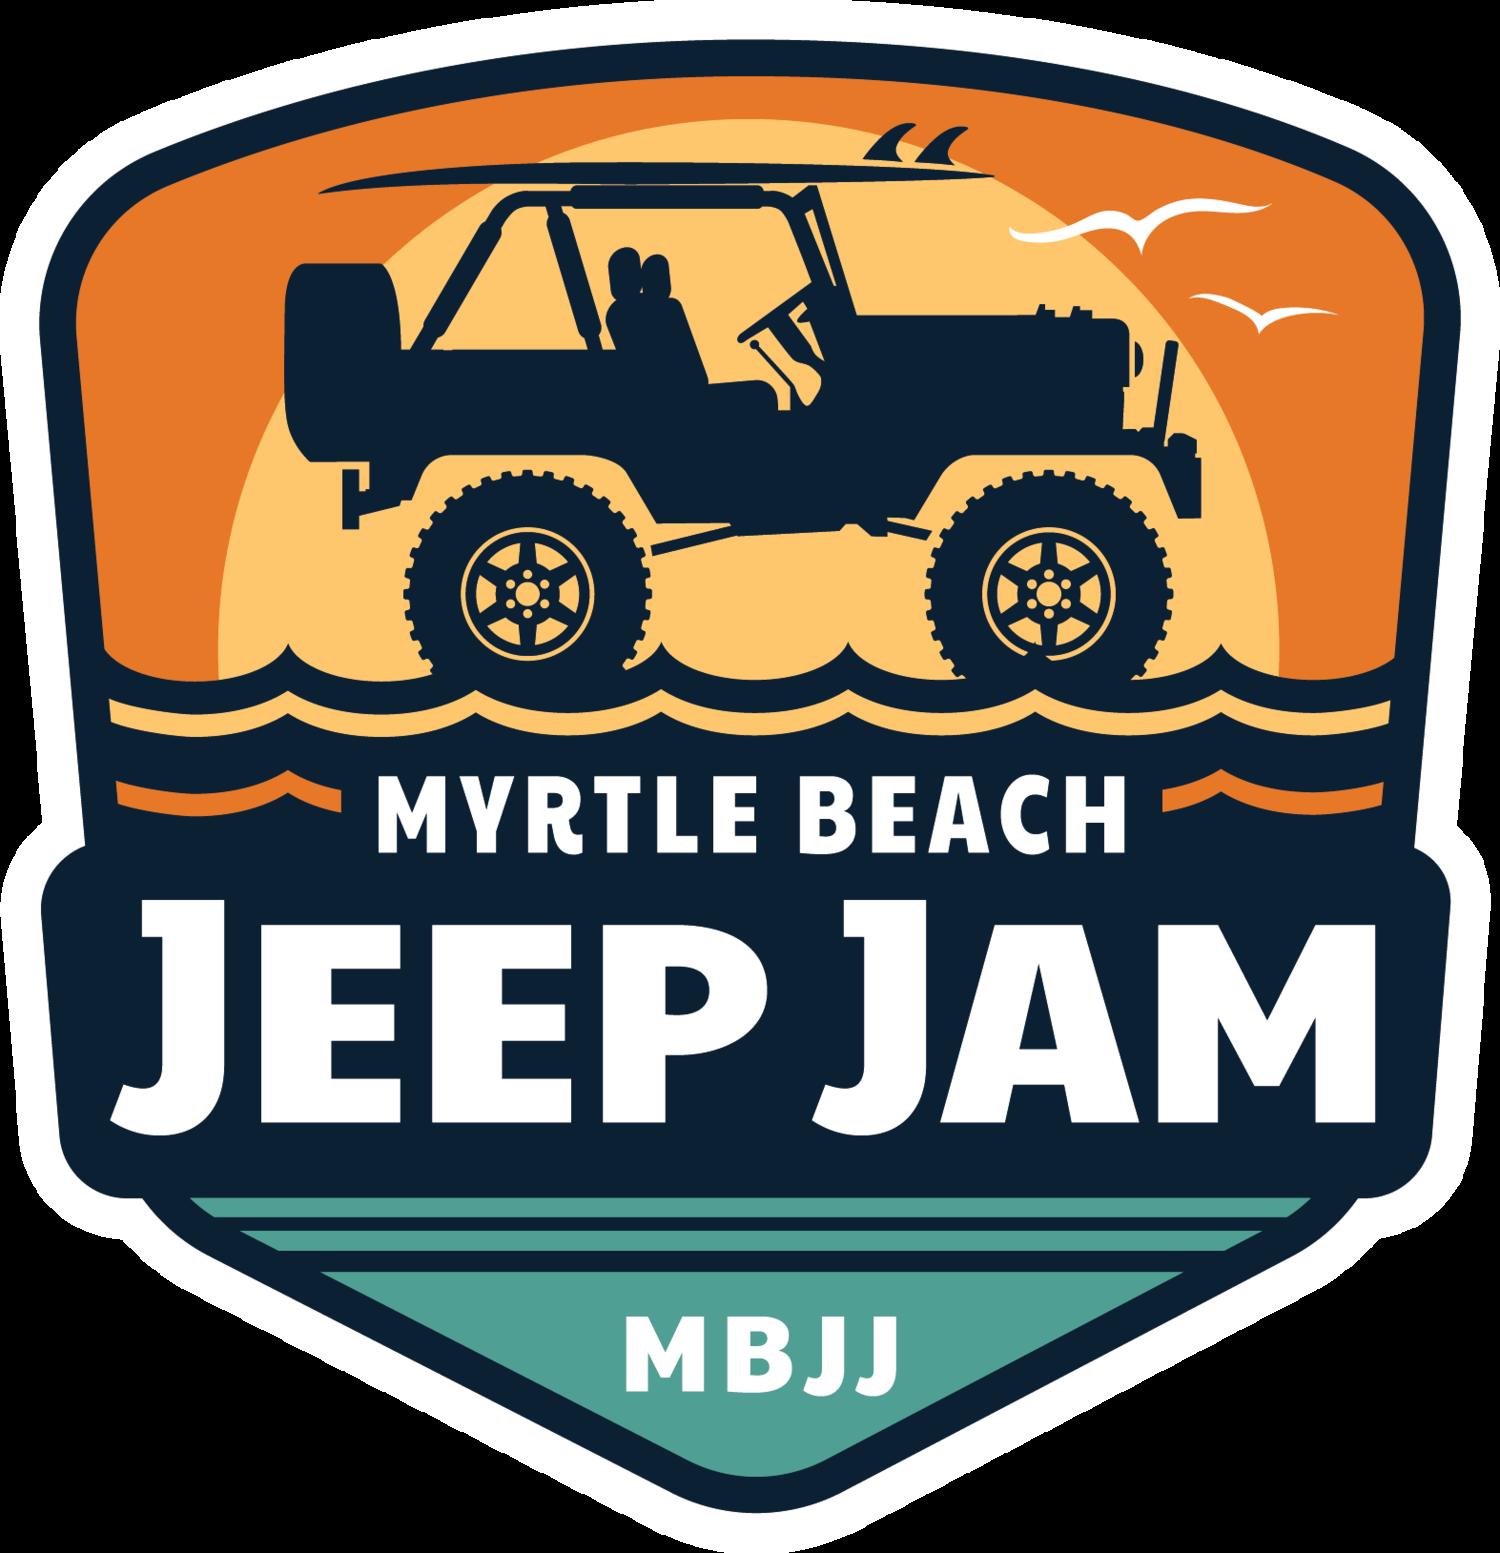 Myrtle Beach Jeep Jam Beach Jeep Jeep Myrtle Beach